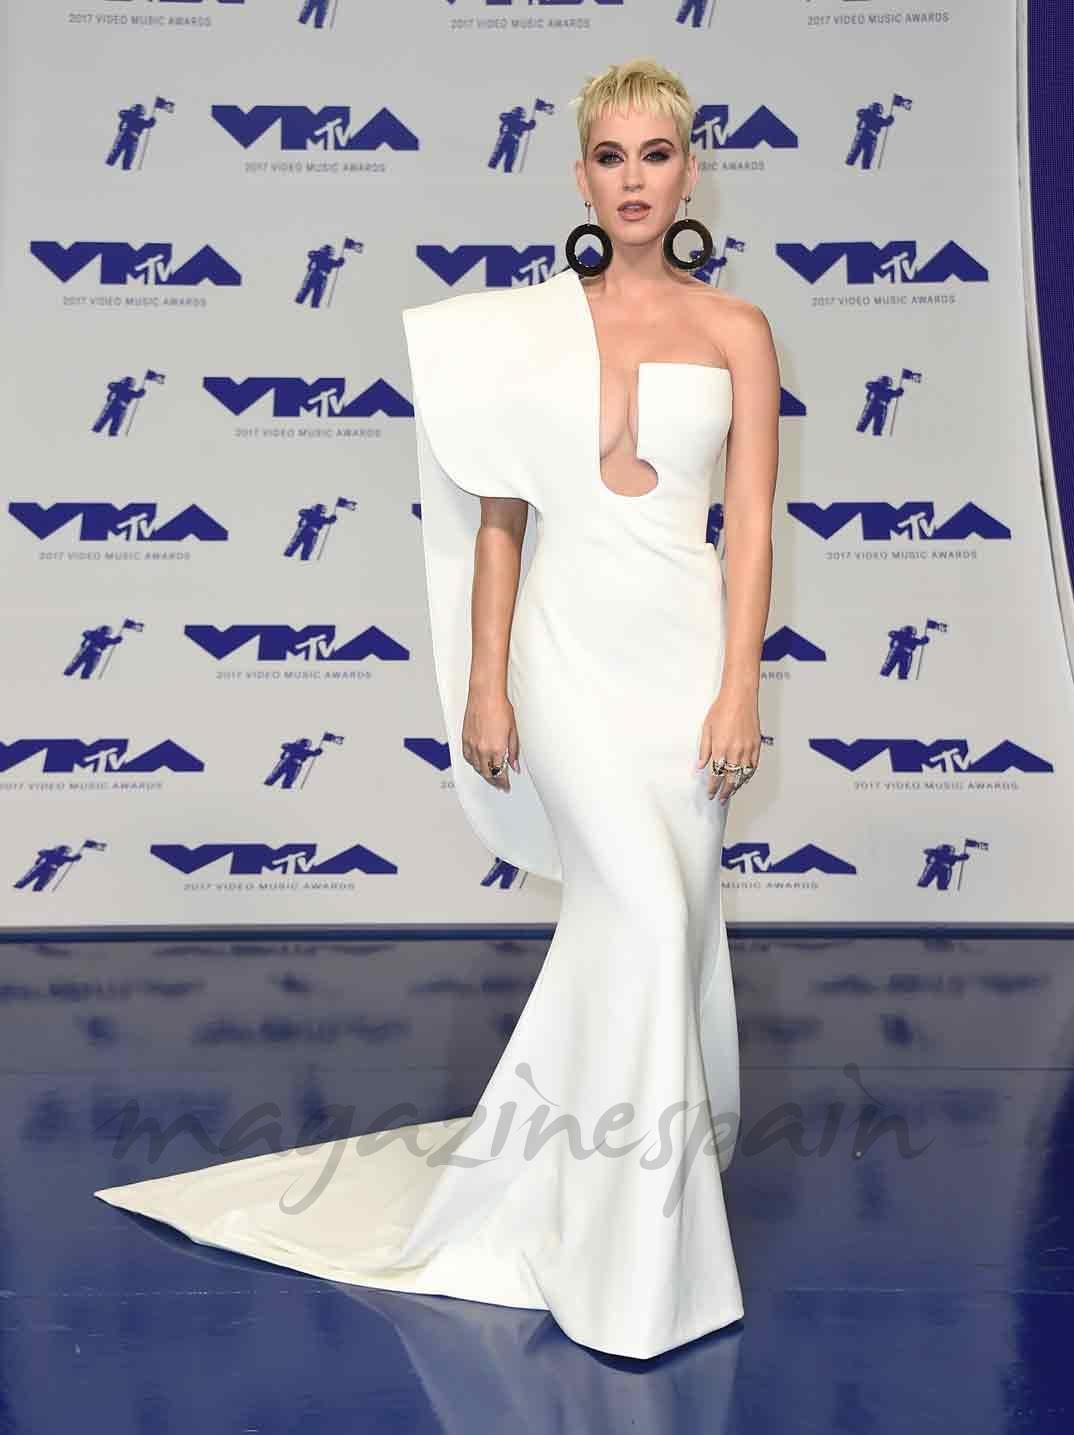 Katy Perry - MTV Video Music Awards